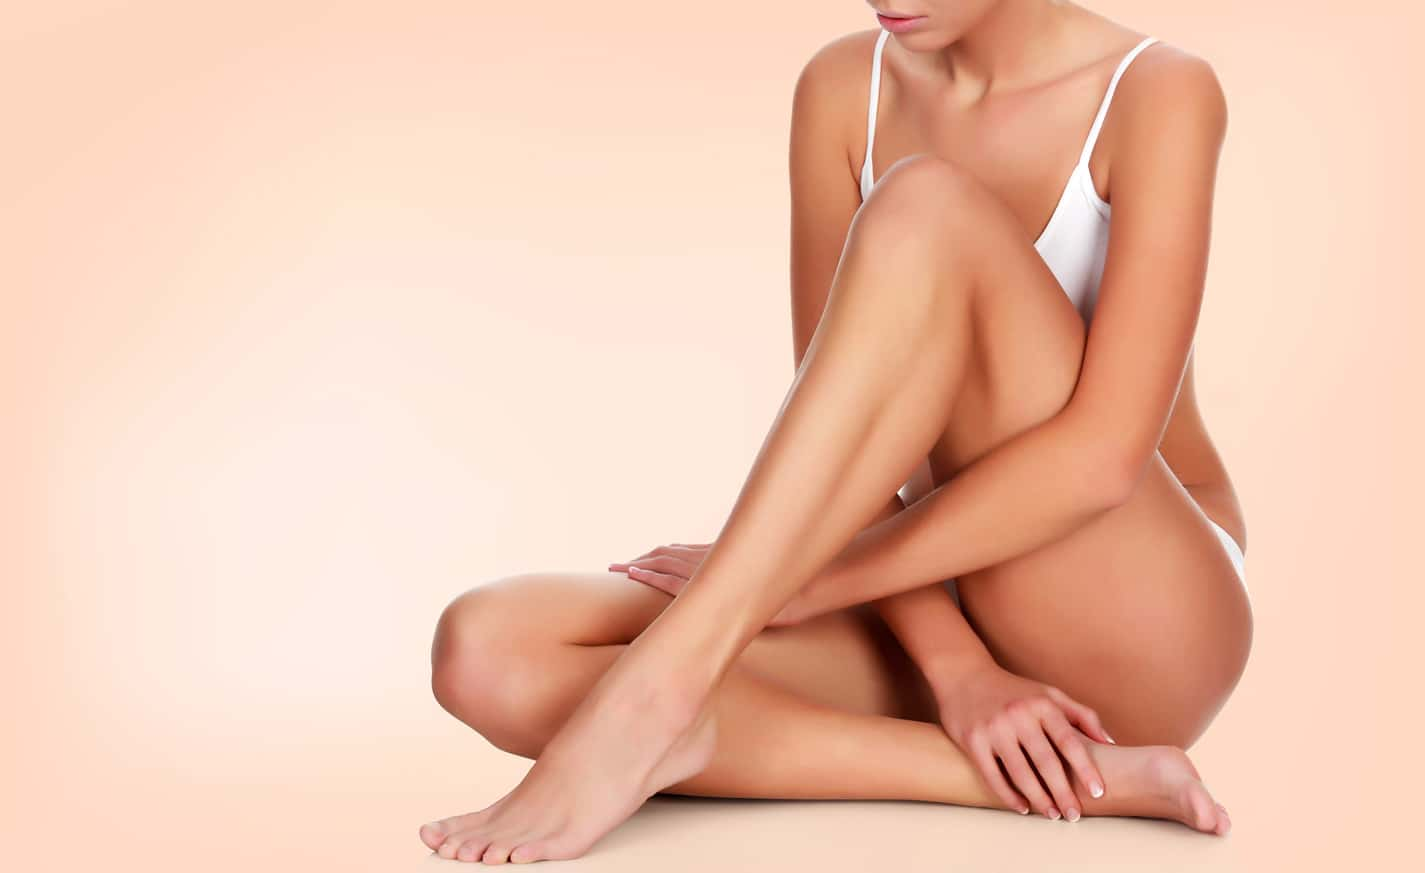 Epilation femme - Forfait jambes/maillot/aisselles